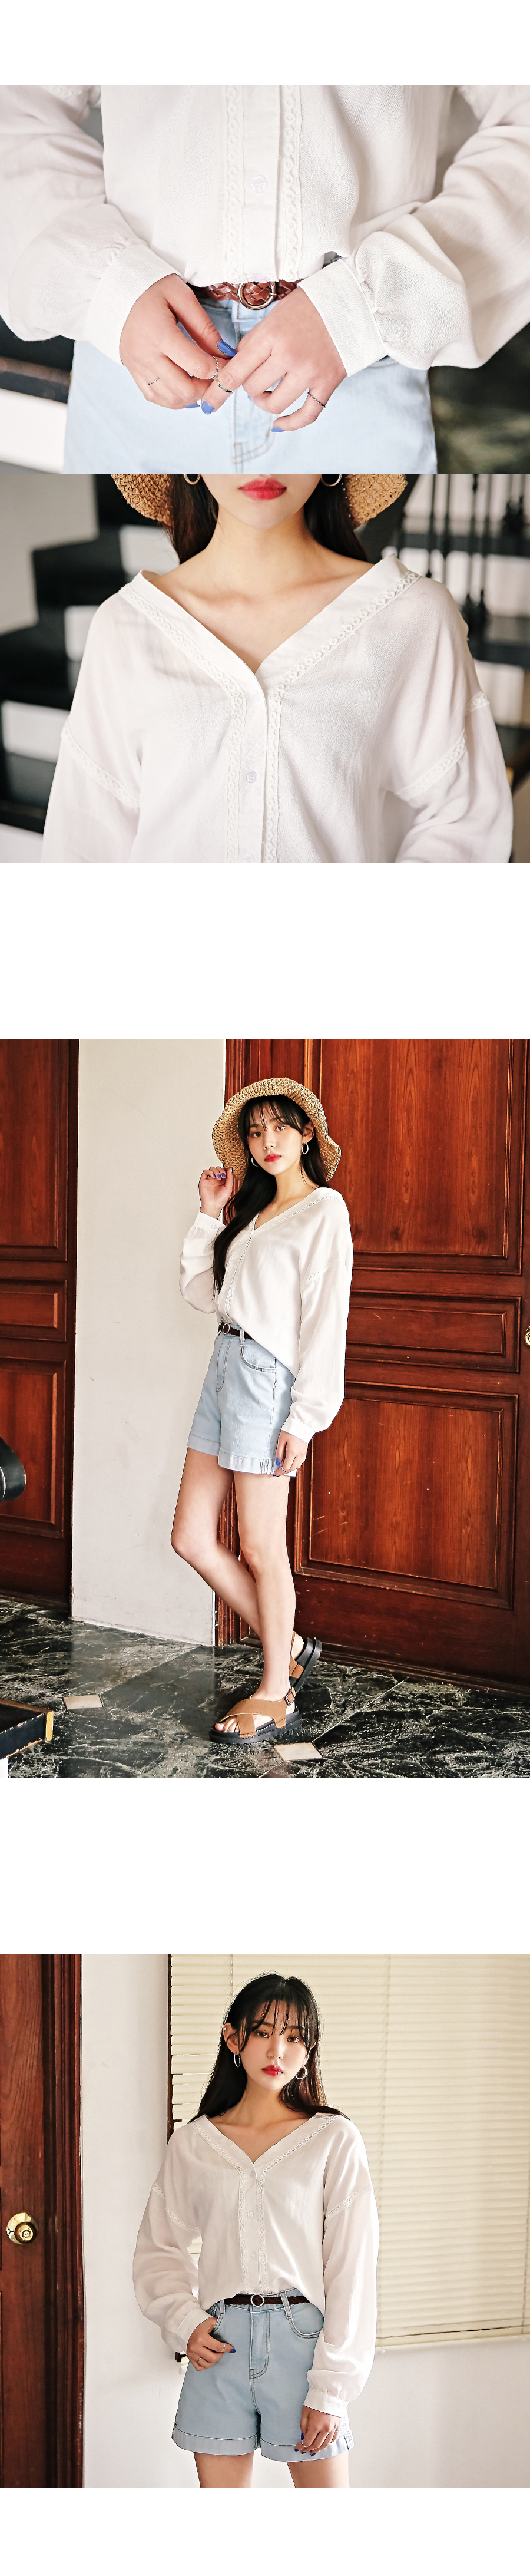 Sheep-V-eyelet blouse